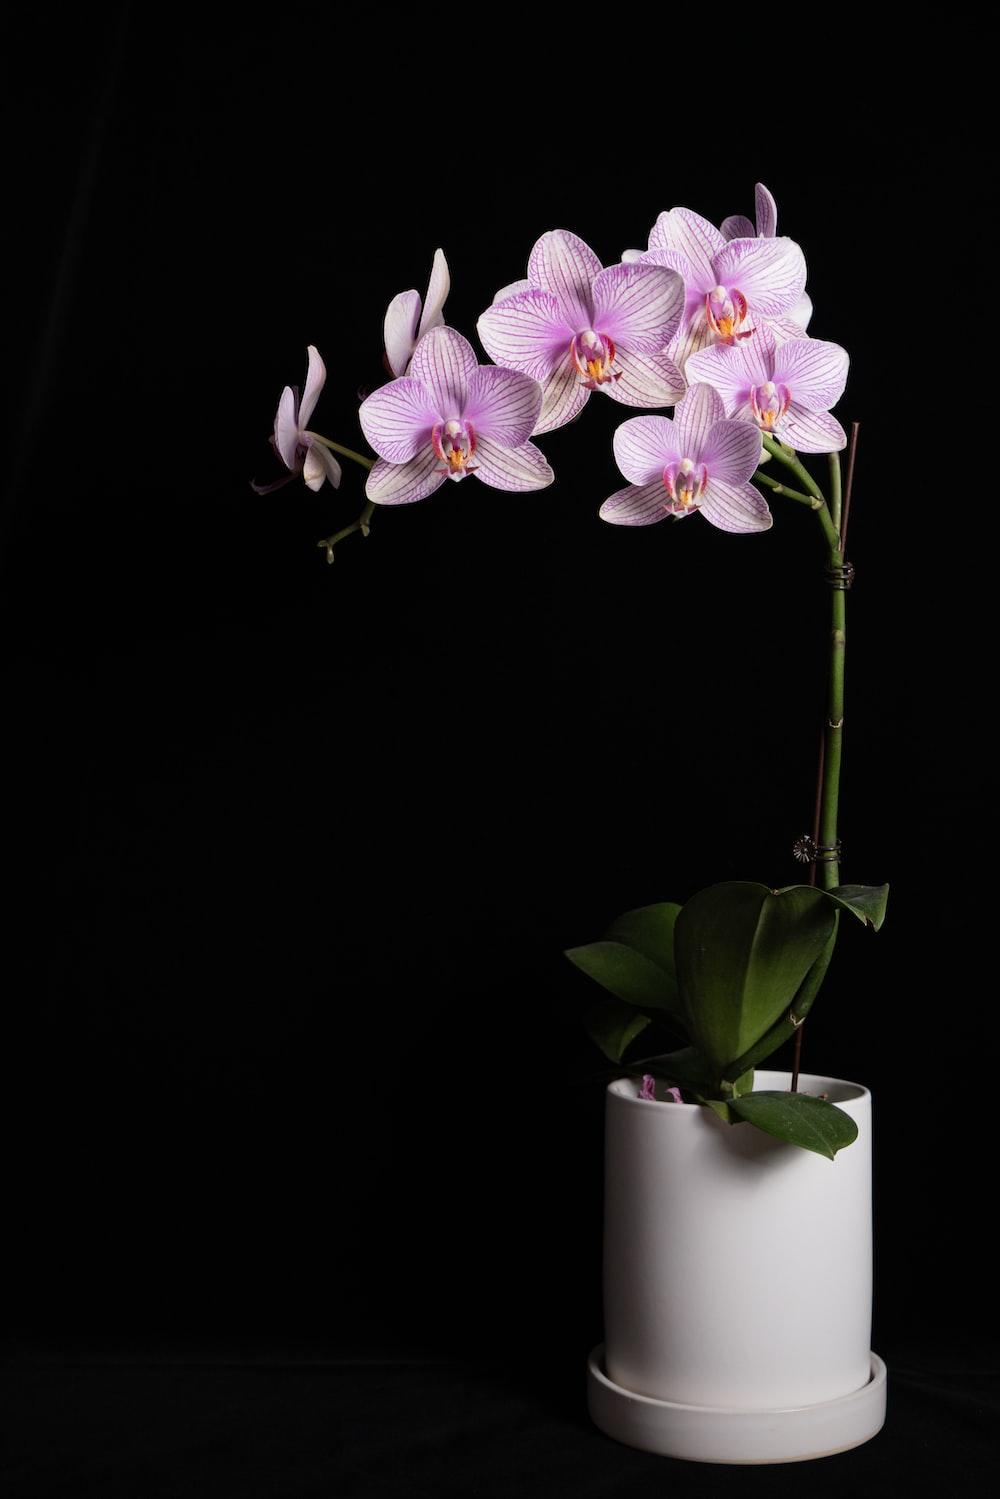 purple and white orchids in white ceramic vase